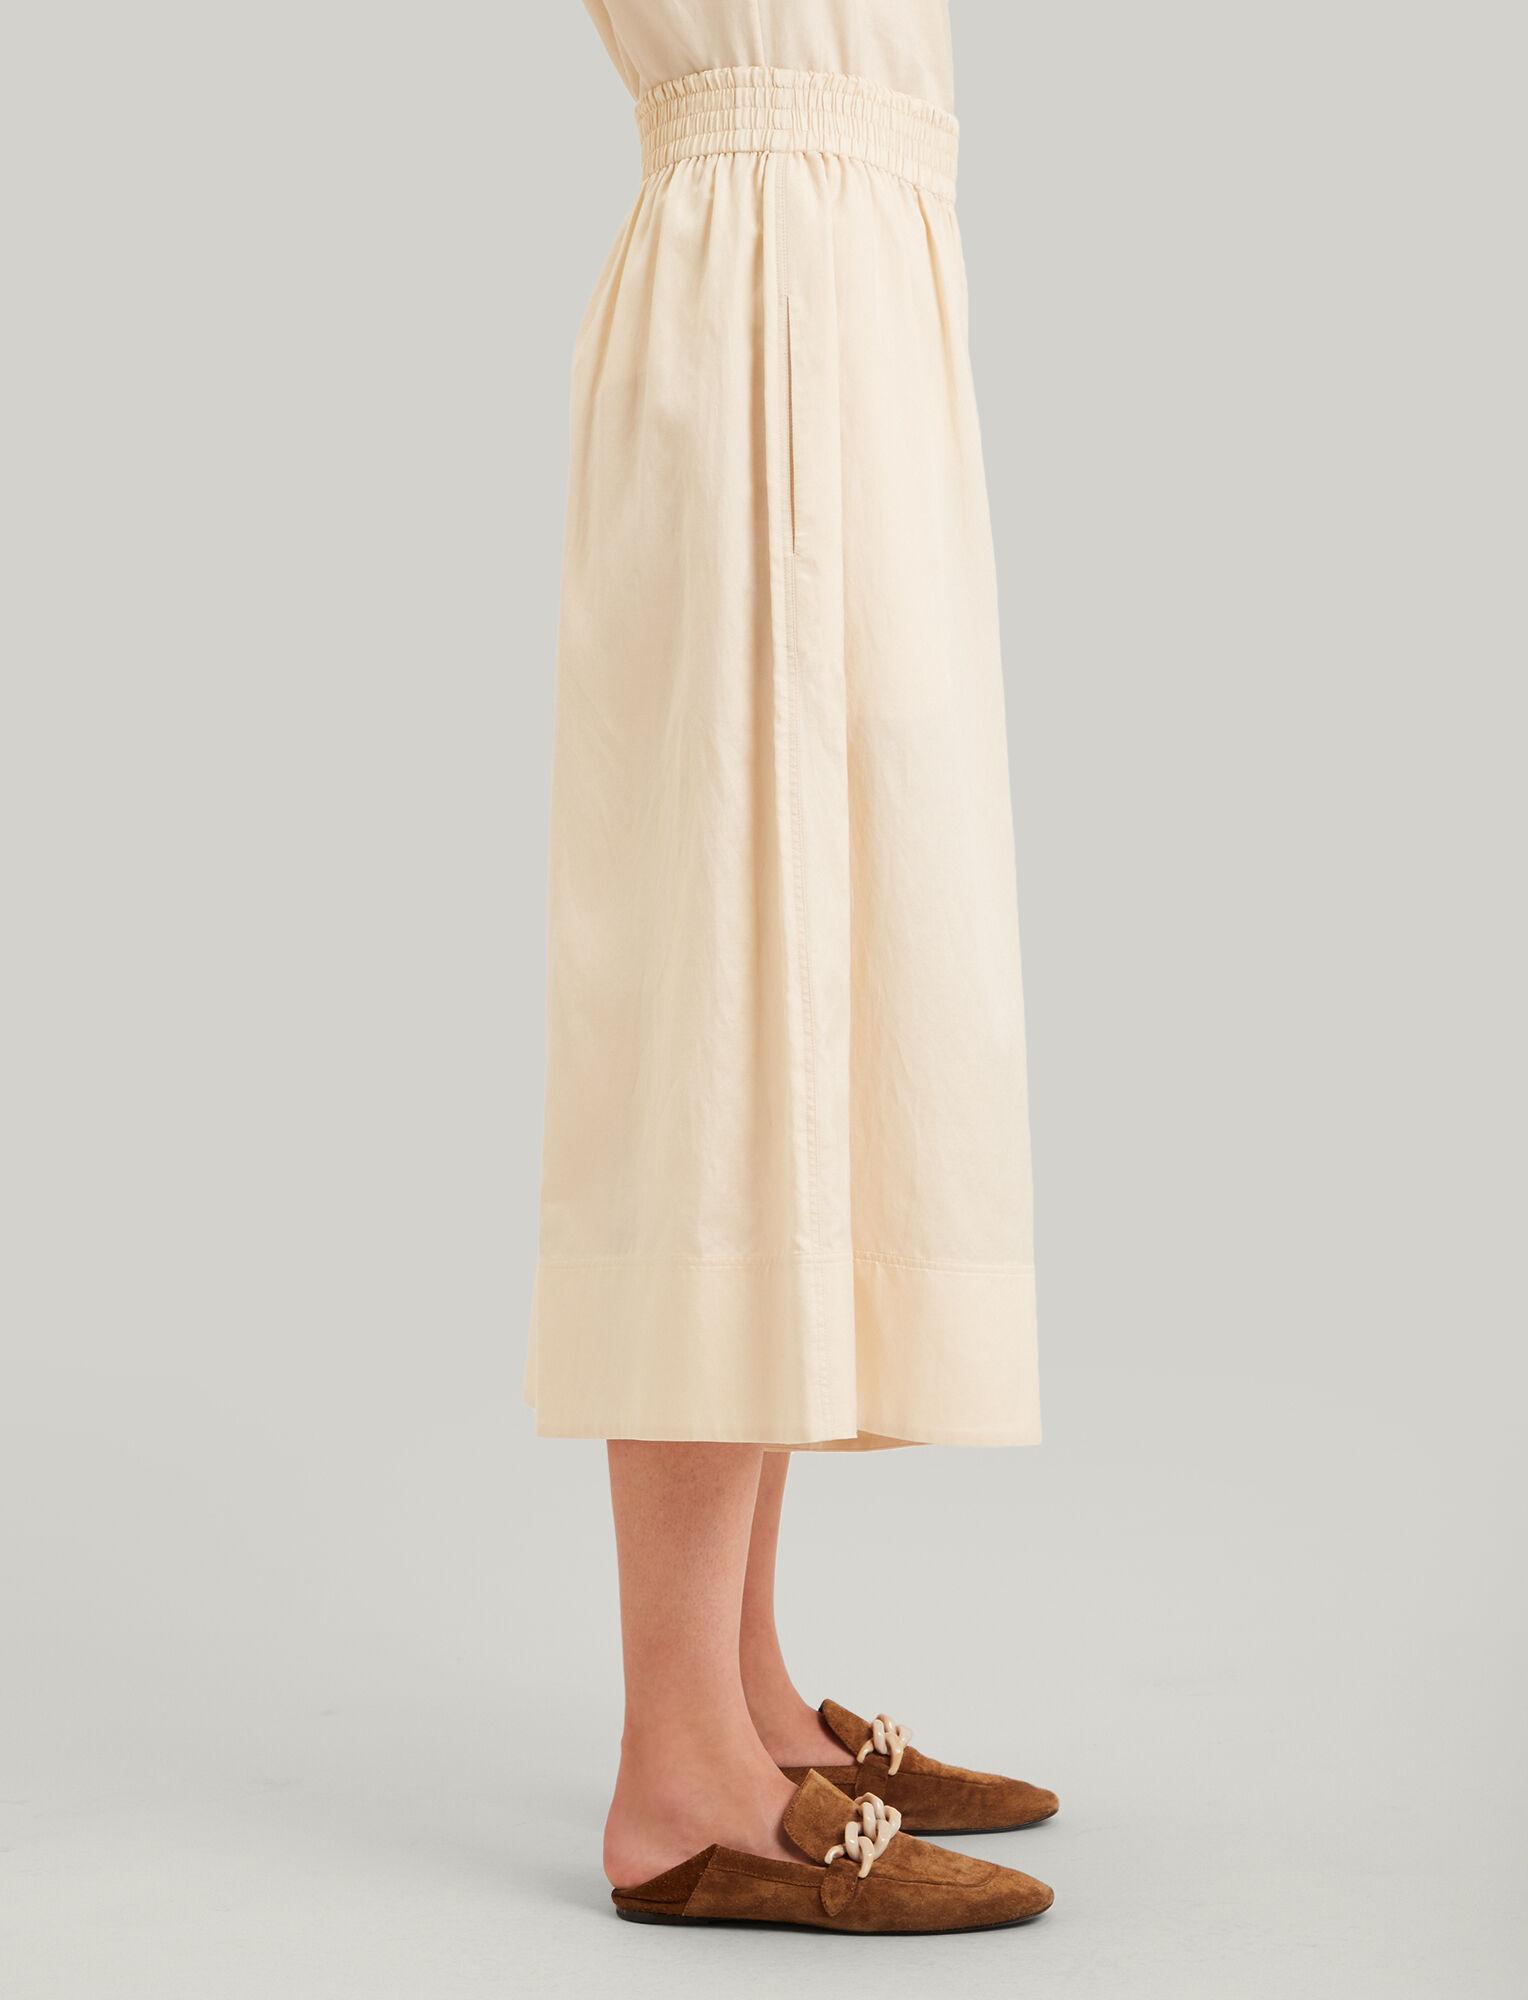 Joseph, Barlon Cotton Silk Shirting Trousers, in BUTTER